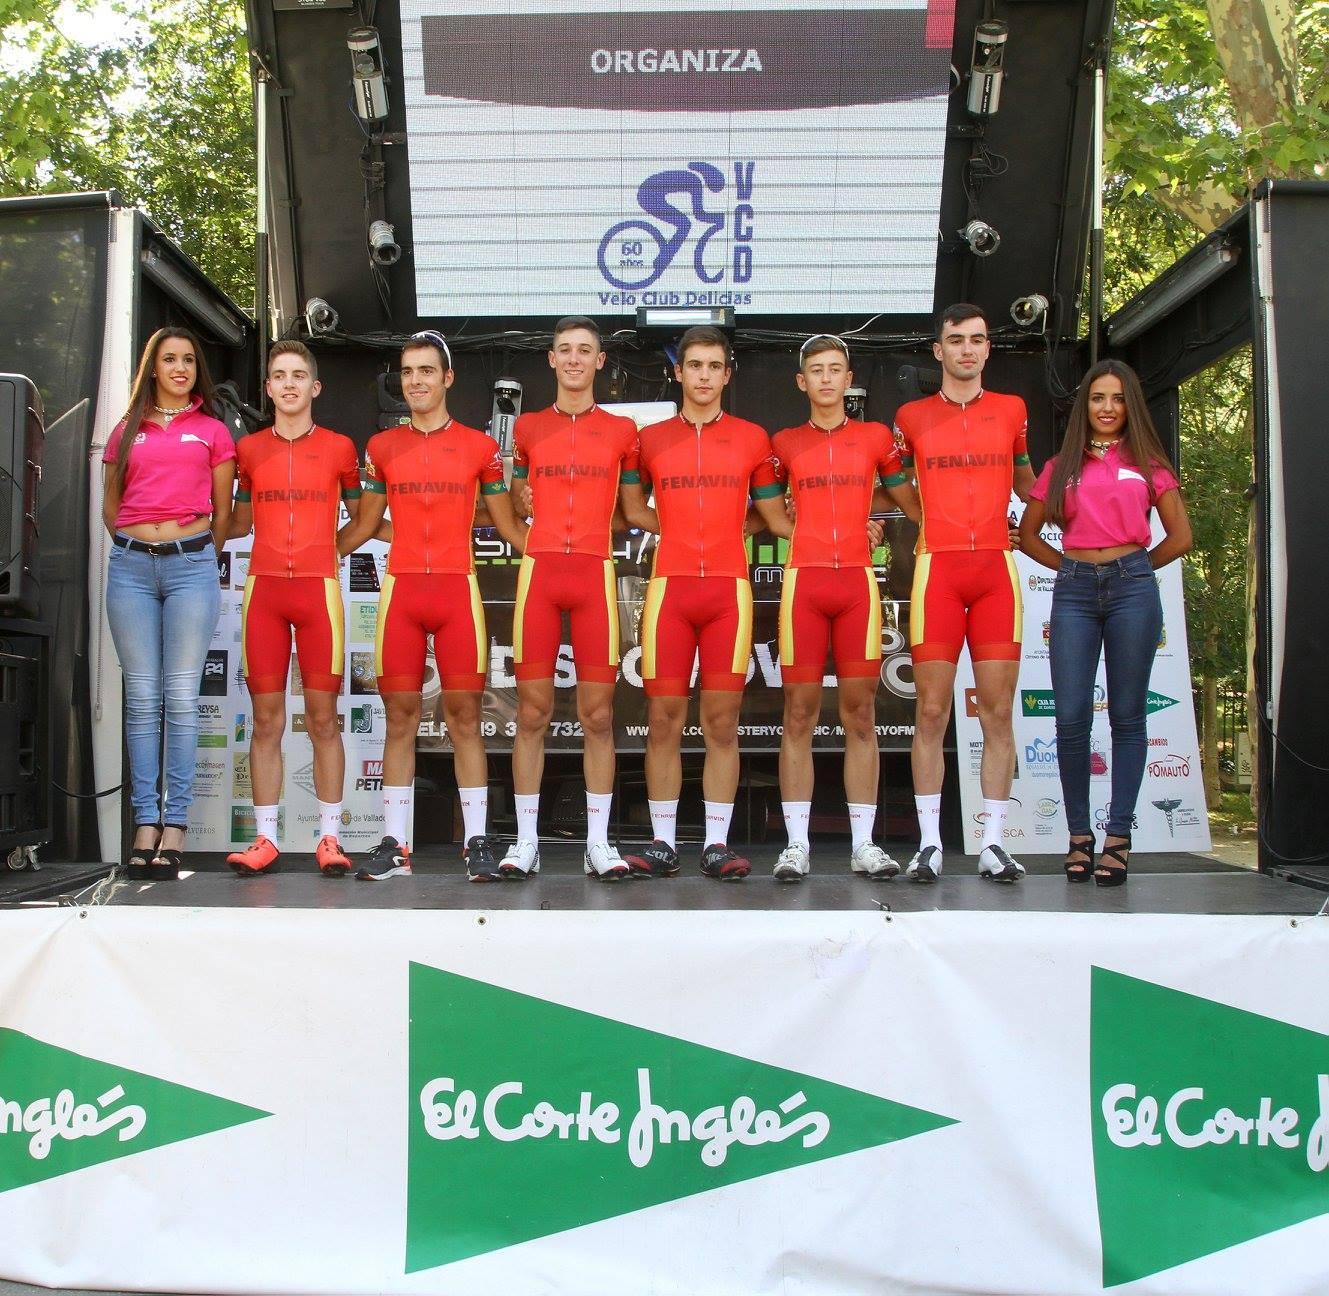 20170728 Podio-Vuelta-Valladolid